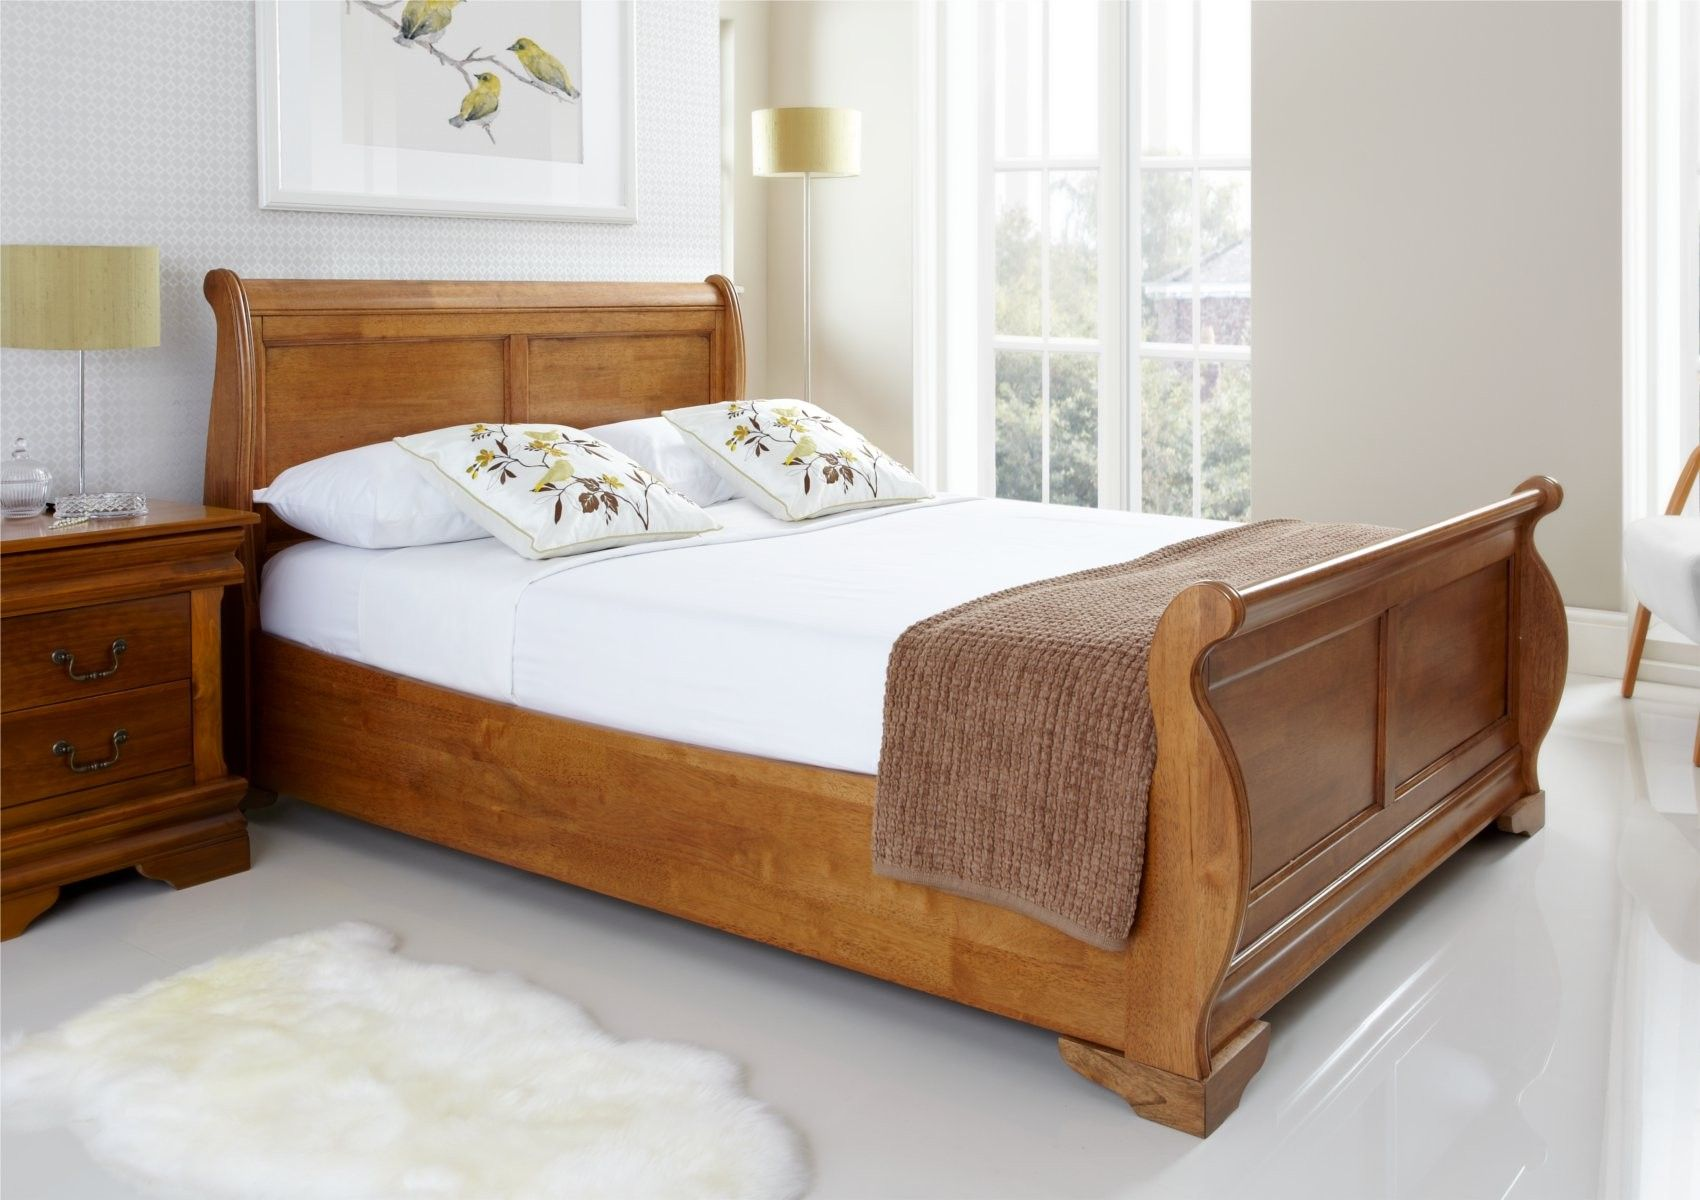 Louie Wooden Sleigh Bed Oak Finish Wooden bed frames